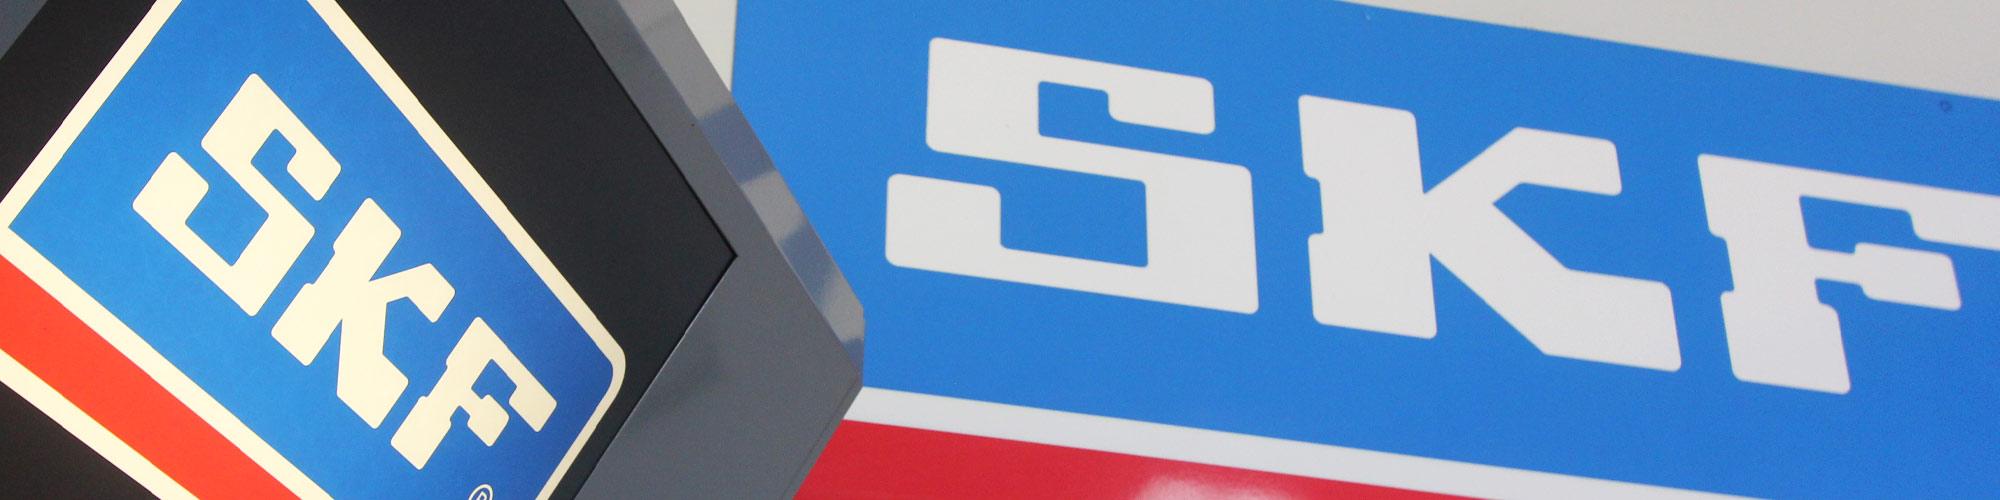 SKF sign